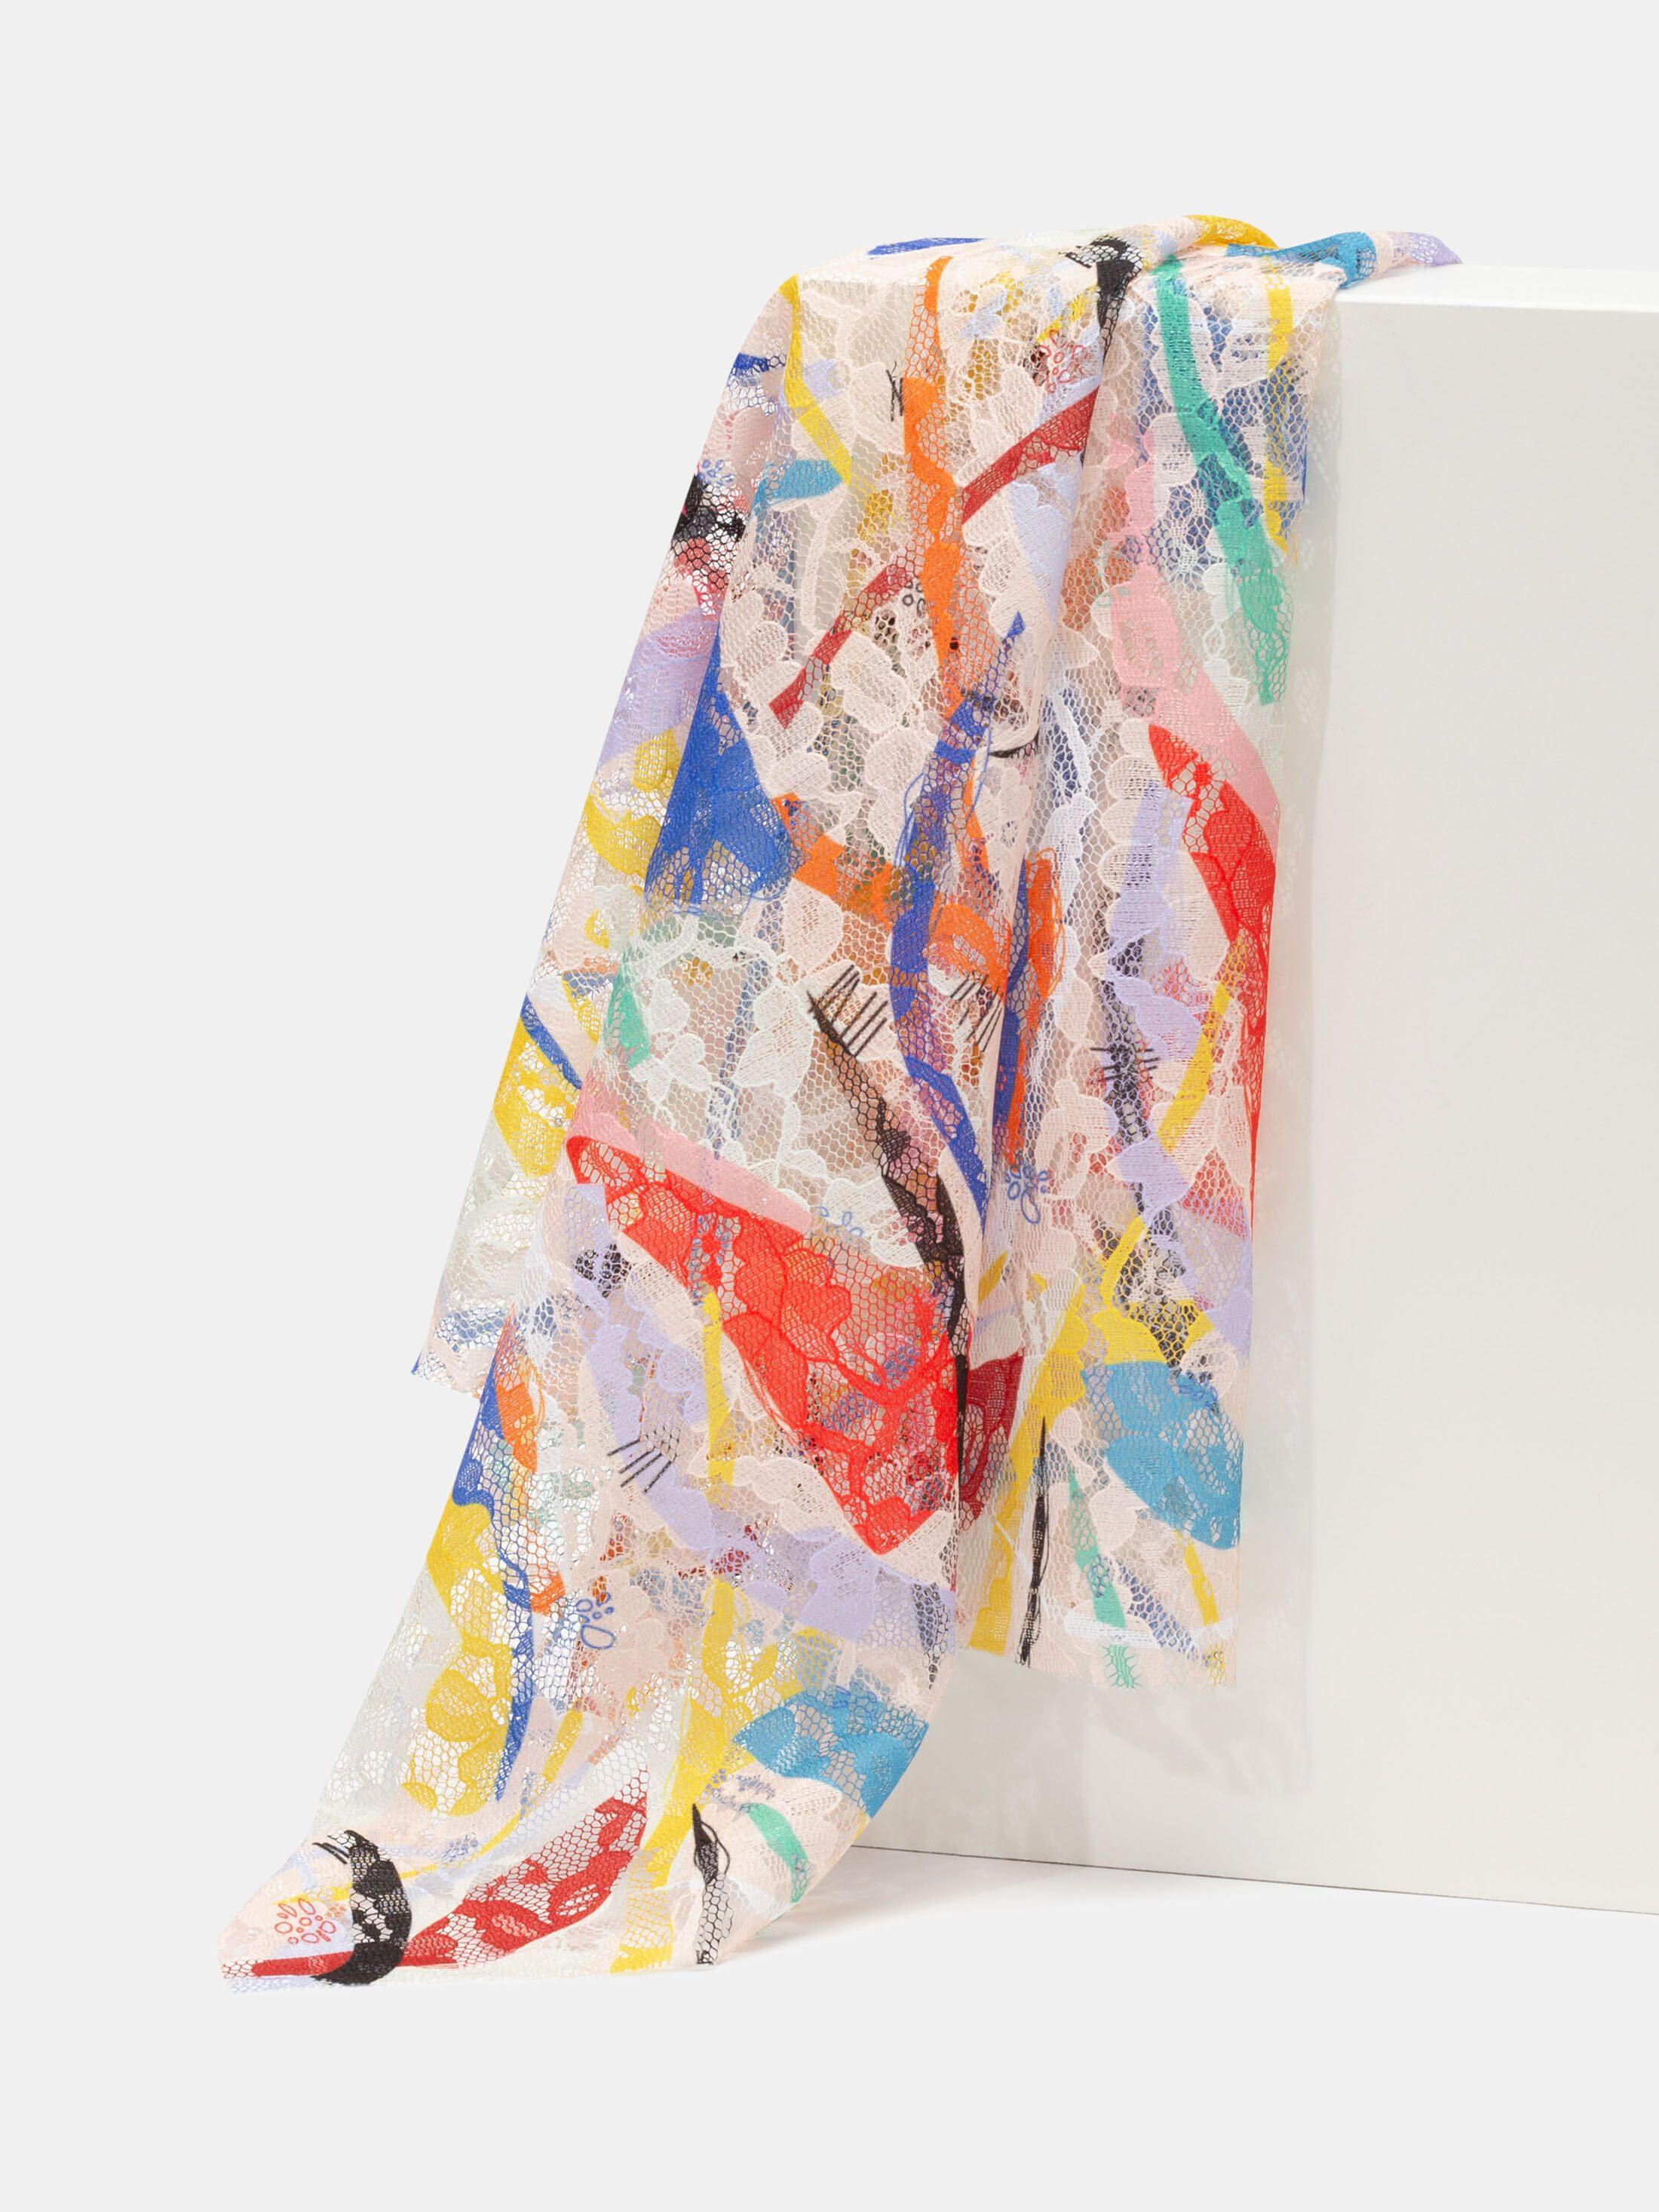 design lace fabric online